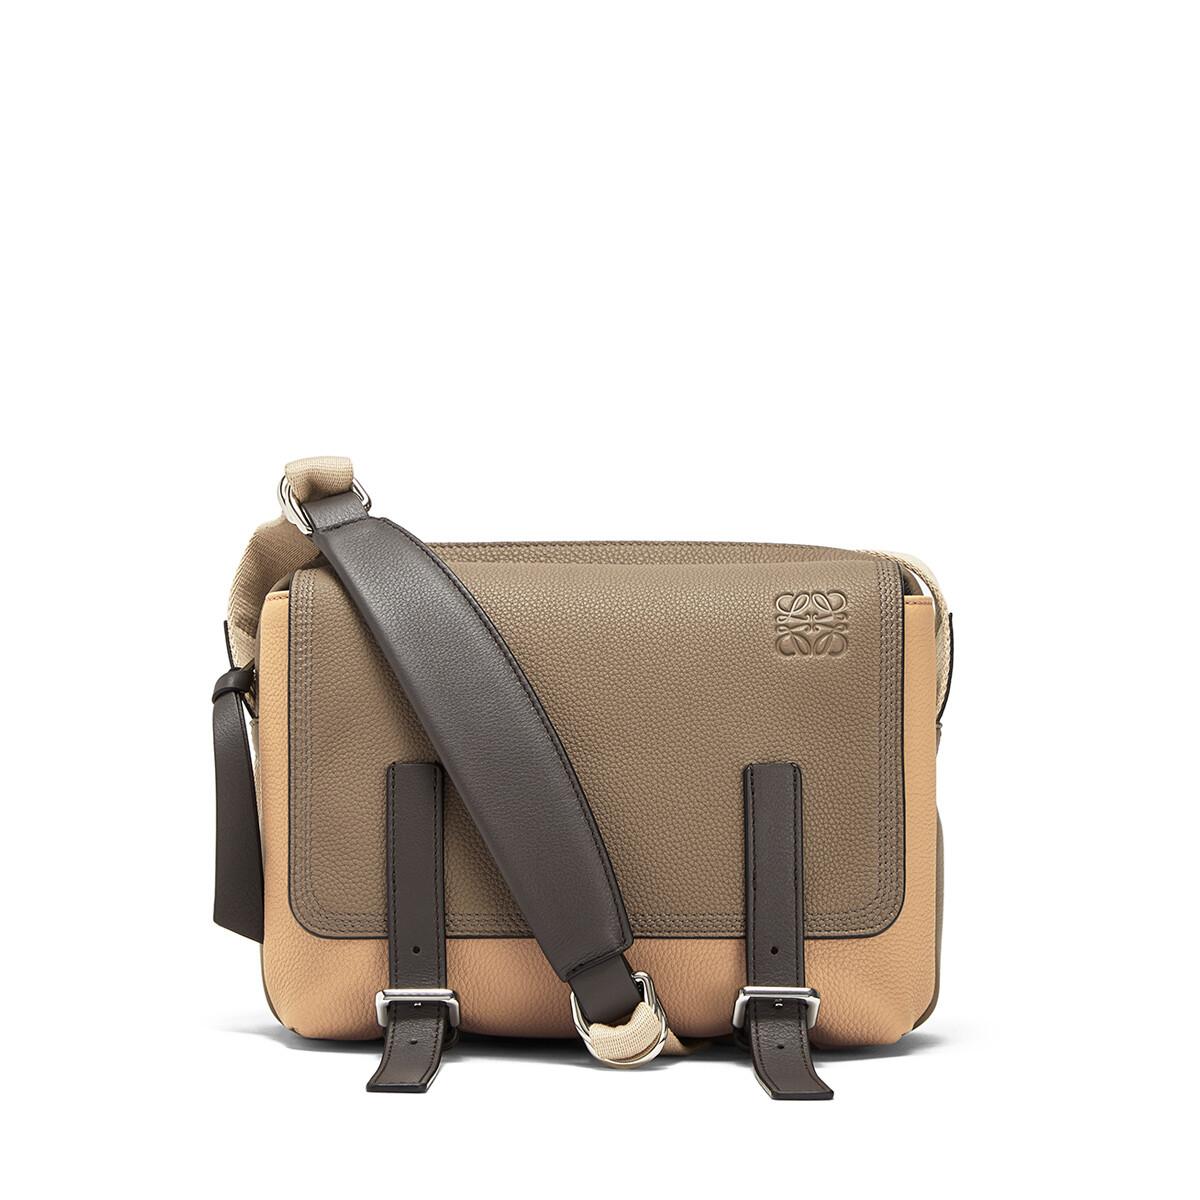 LOEWE Military Messenger Xs Bag Dark Taupe/Desert front